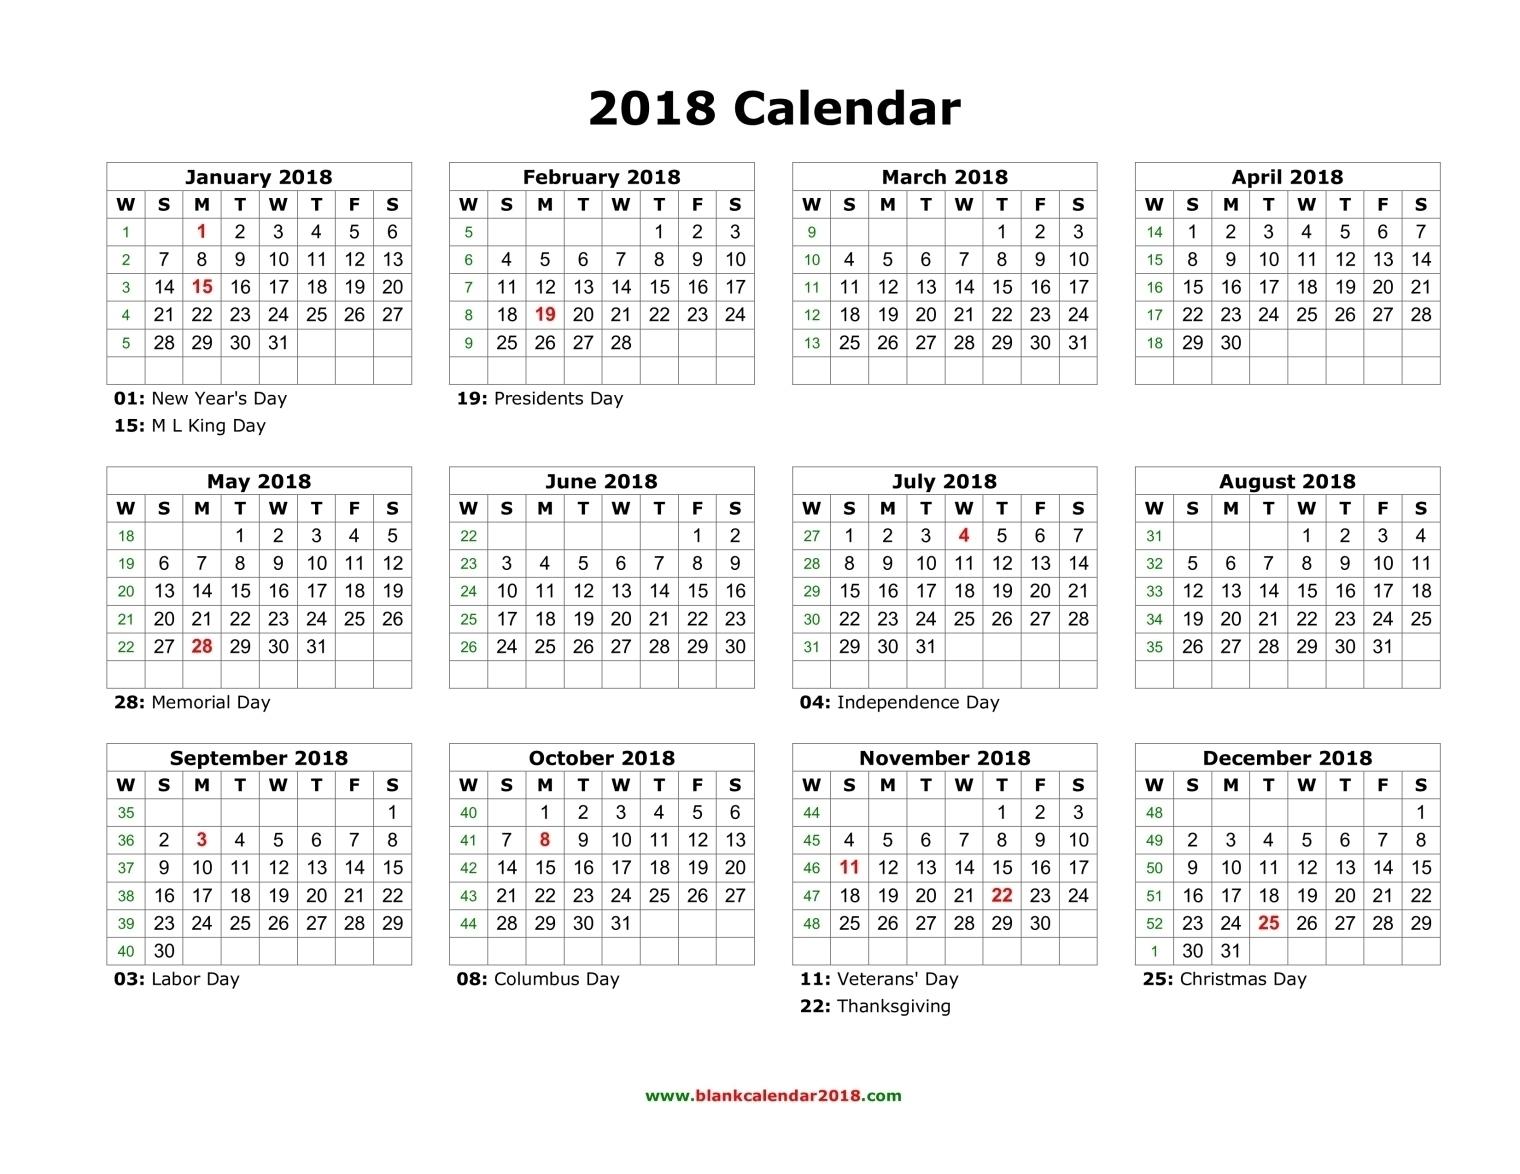 Blank Calendar 2018 Exceptional Blank Calendar Month View